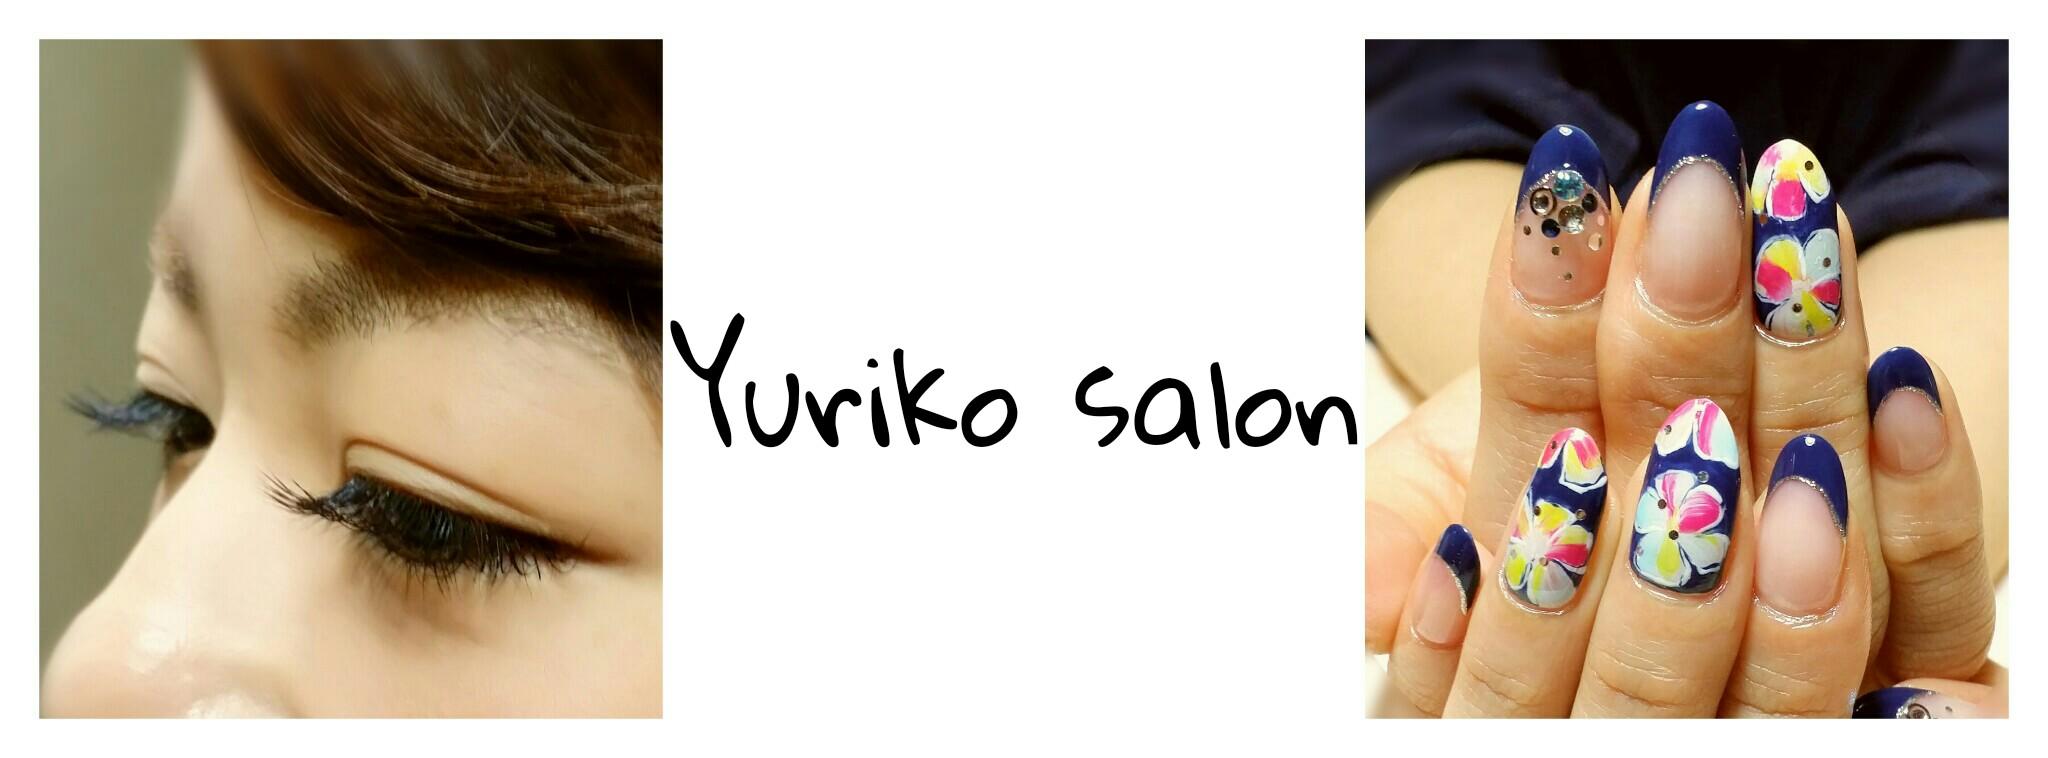 yuriko salon